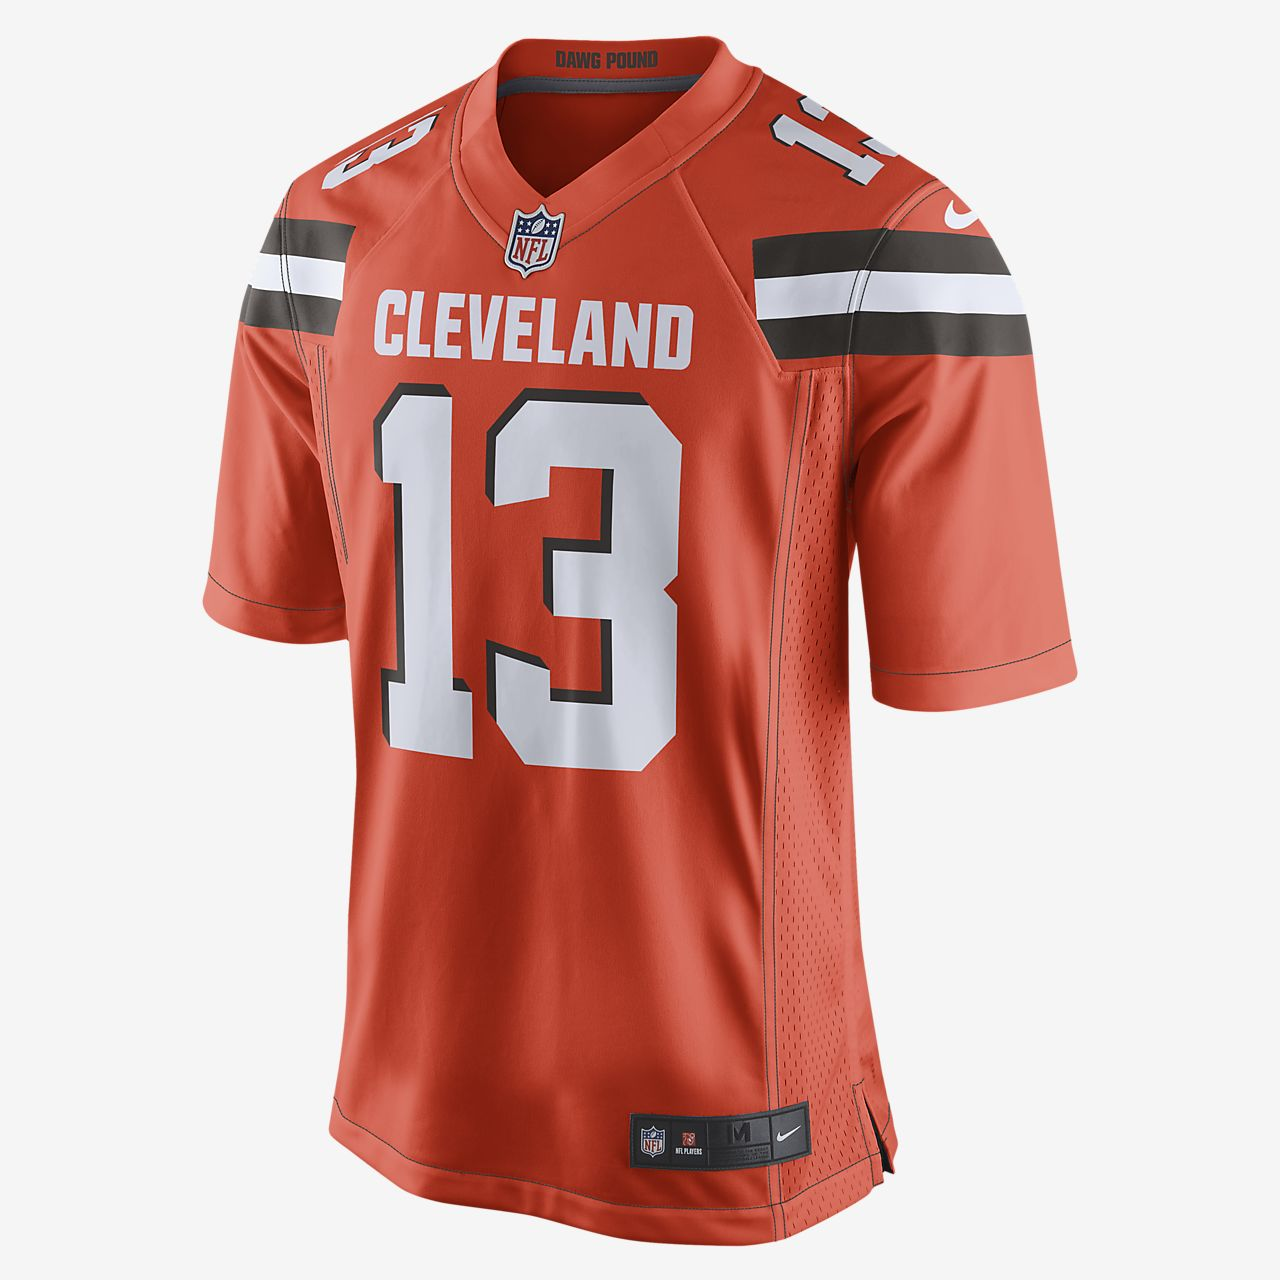 cleveland browns nike shirt